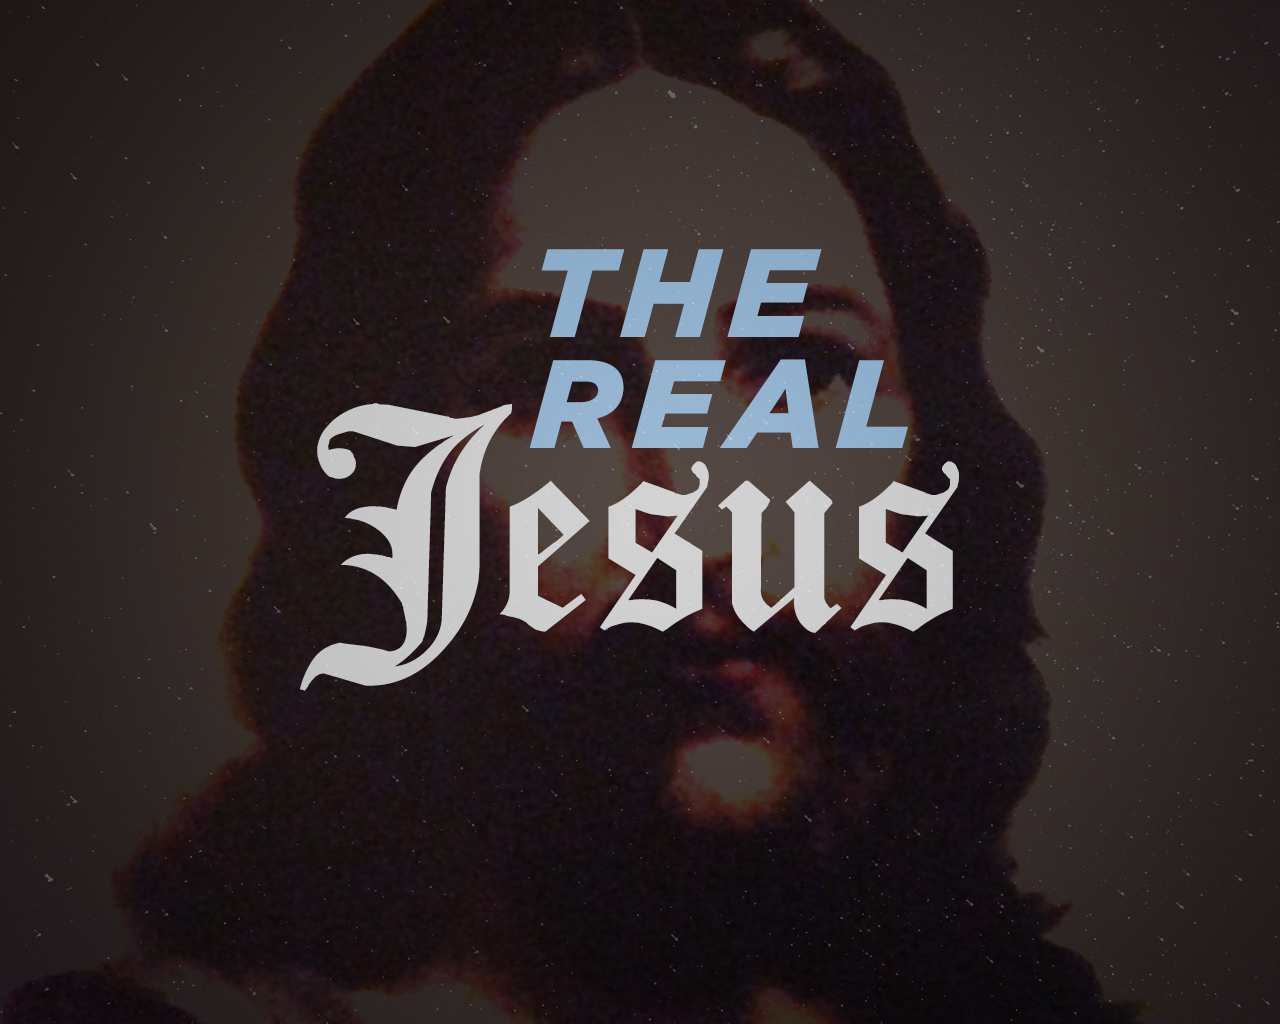 TheRealJesus.jpg